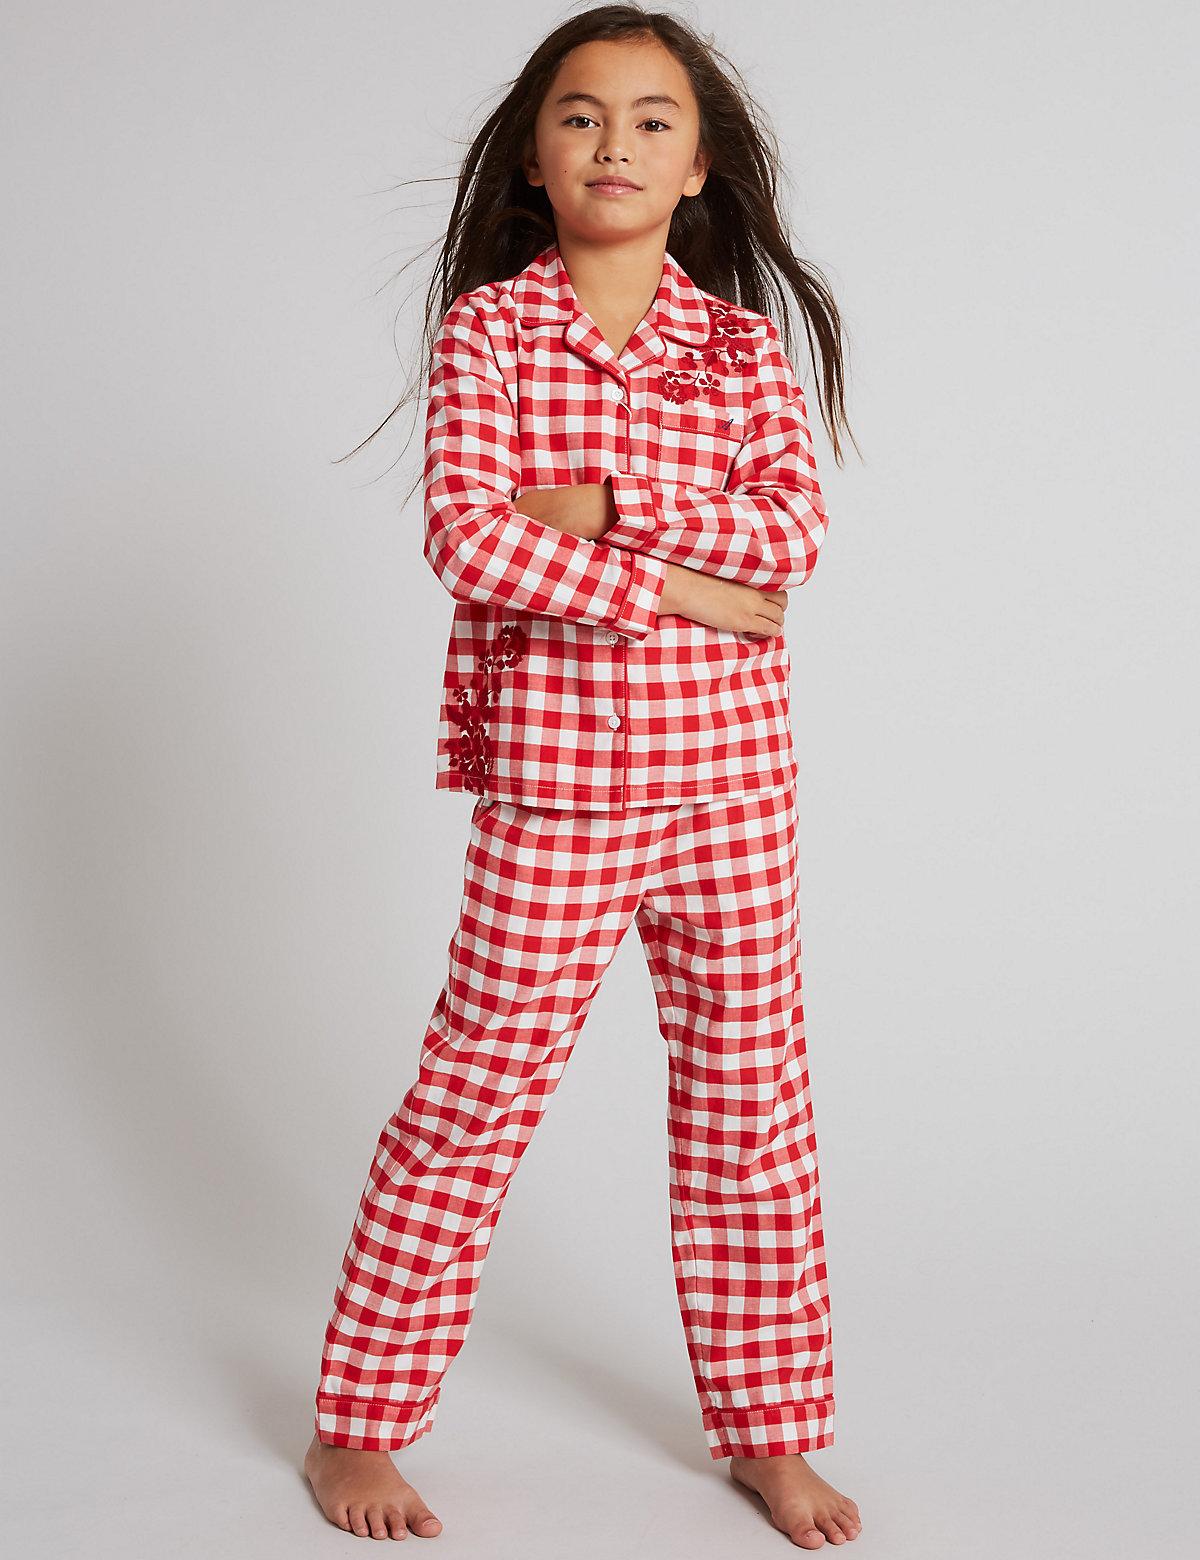 Autograph Pure Cotton Checked Pyjamas (1-16 Years)